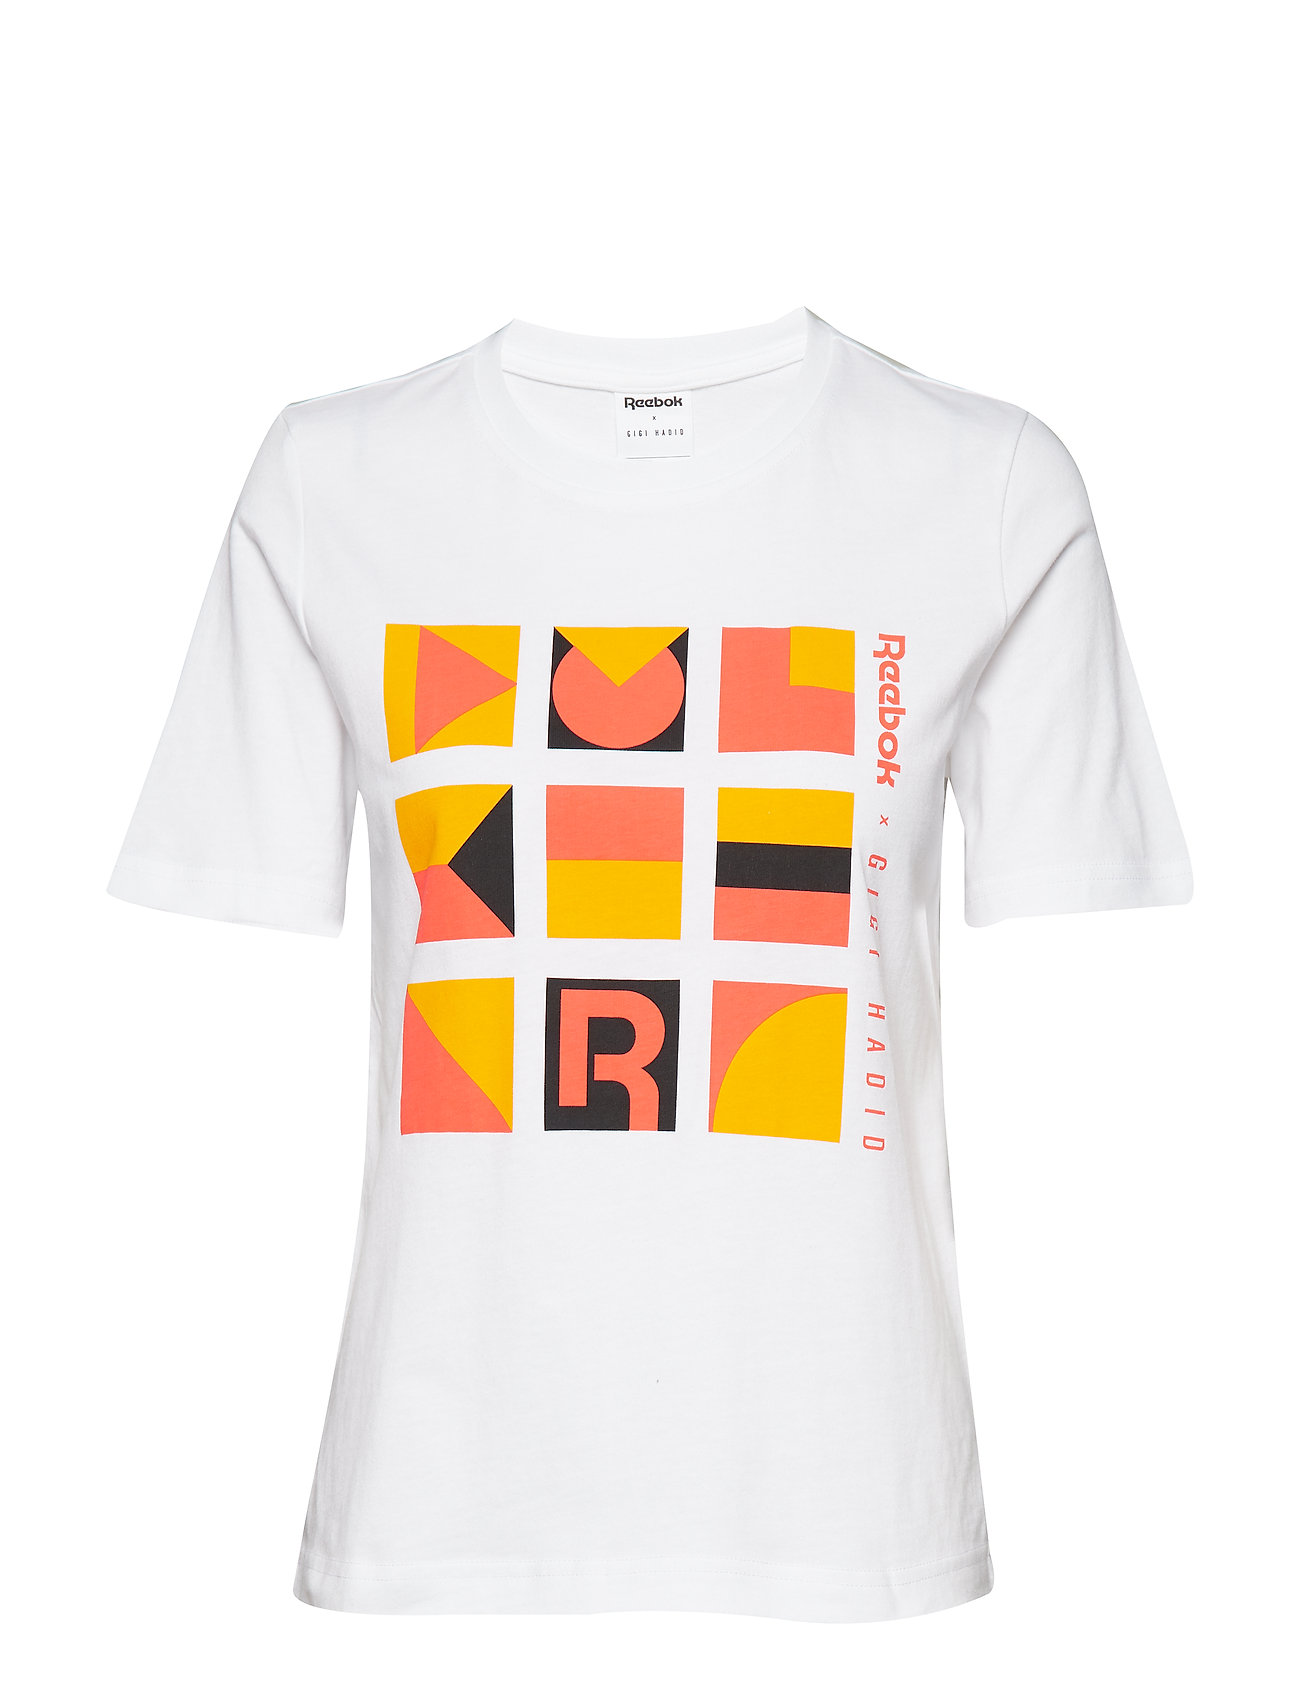 Reebok Classics Gigi Tshirt T-shirts & Tops Short-sleeved Vit Reebok Classics